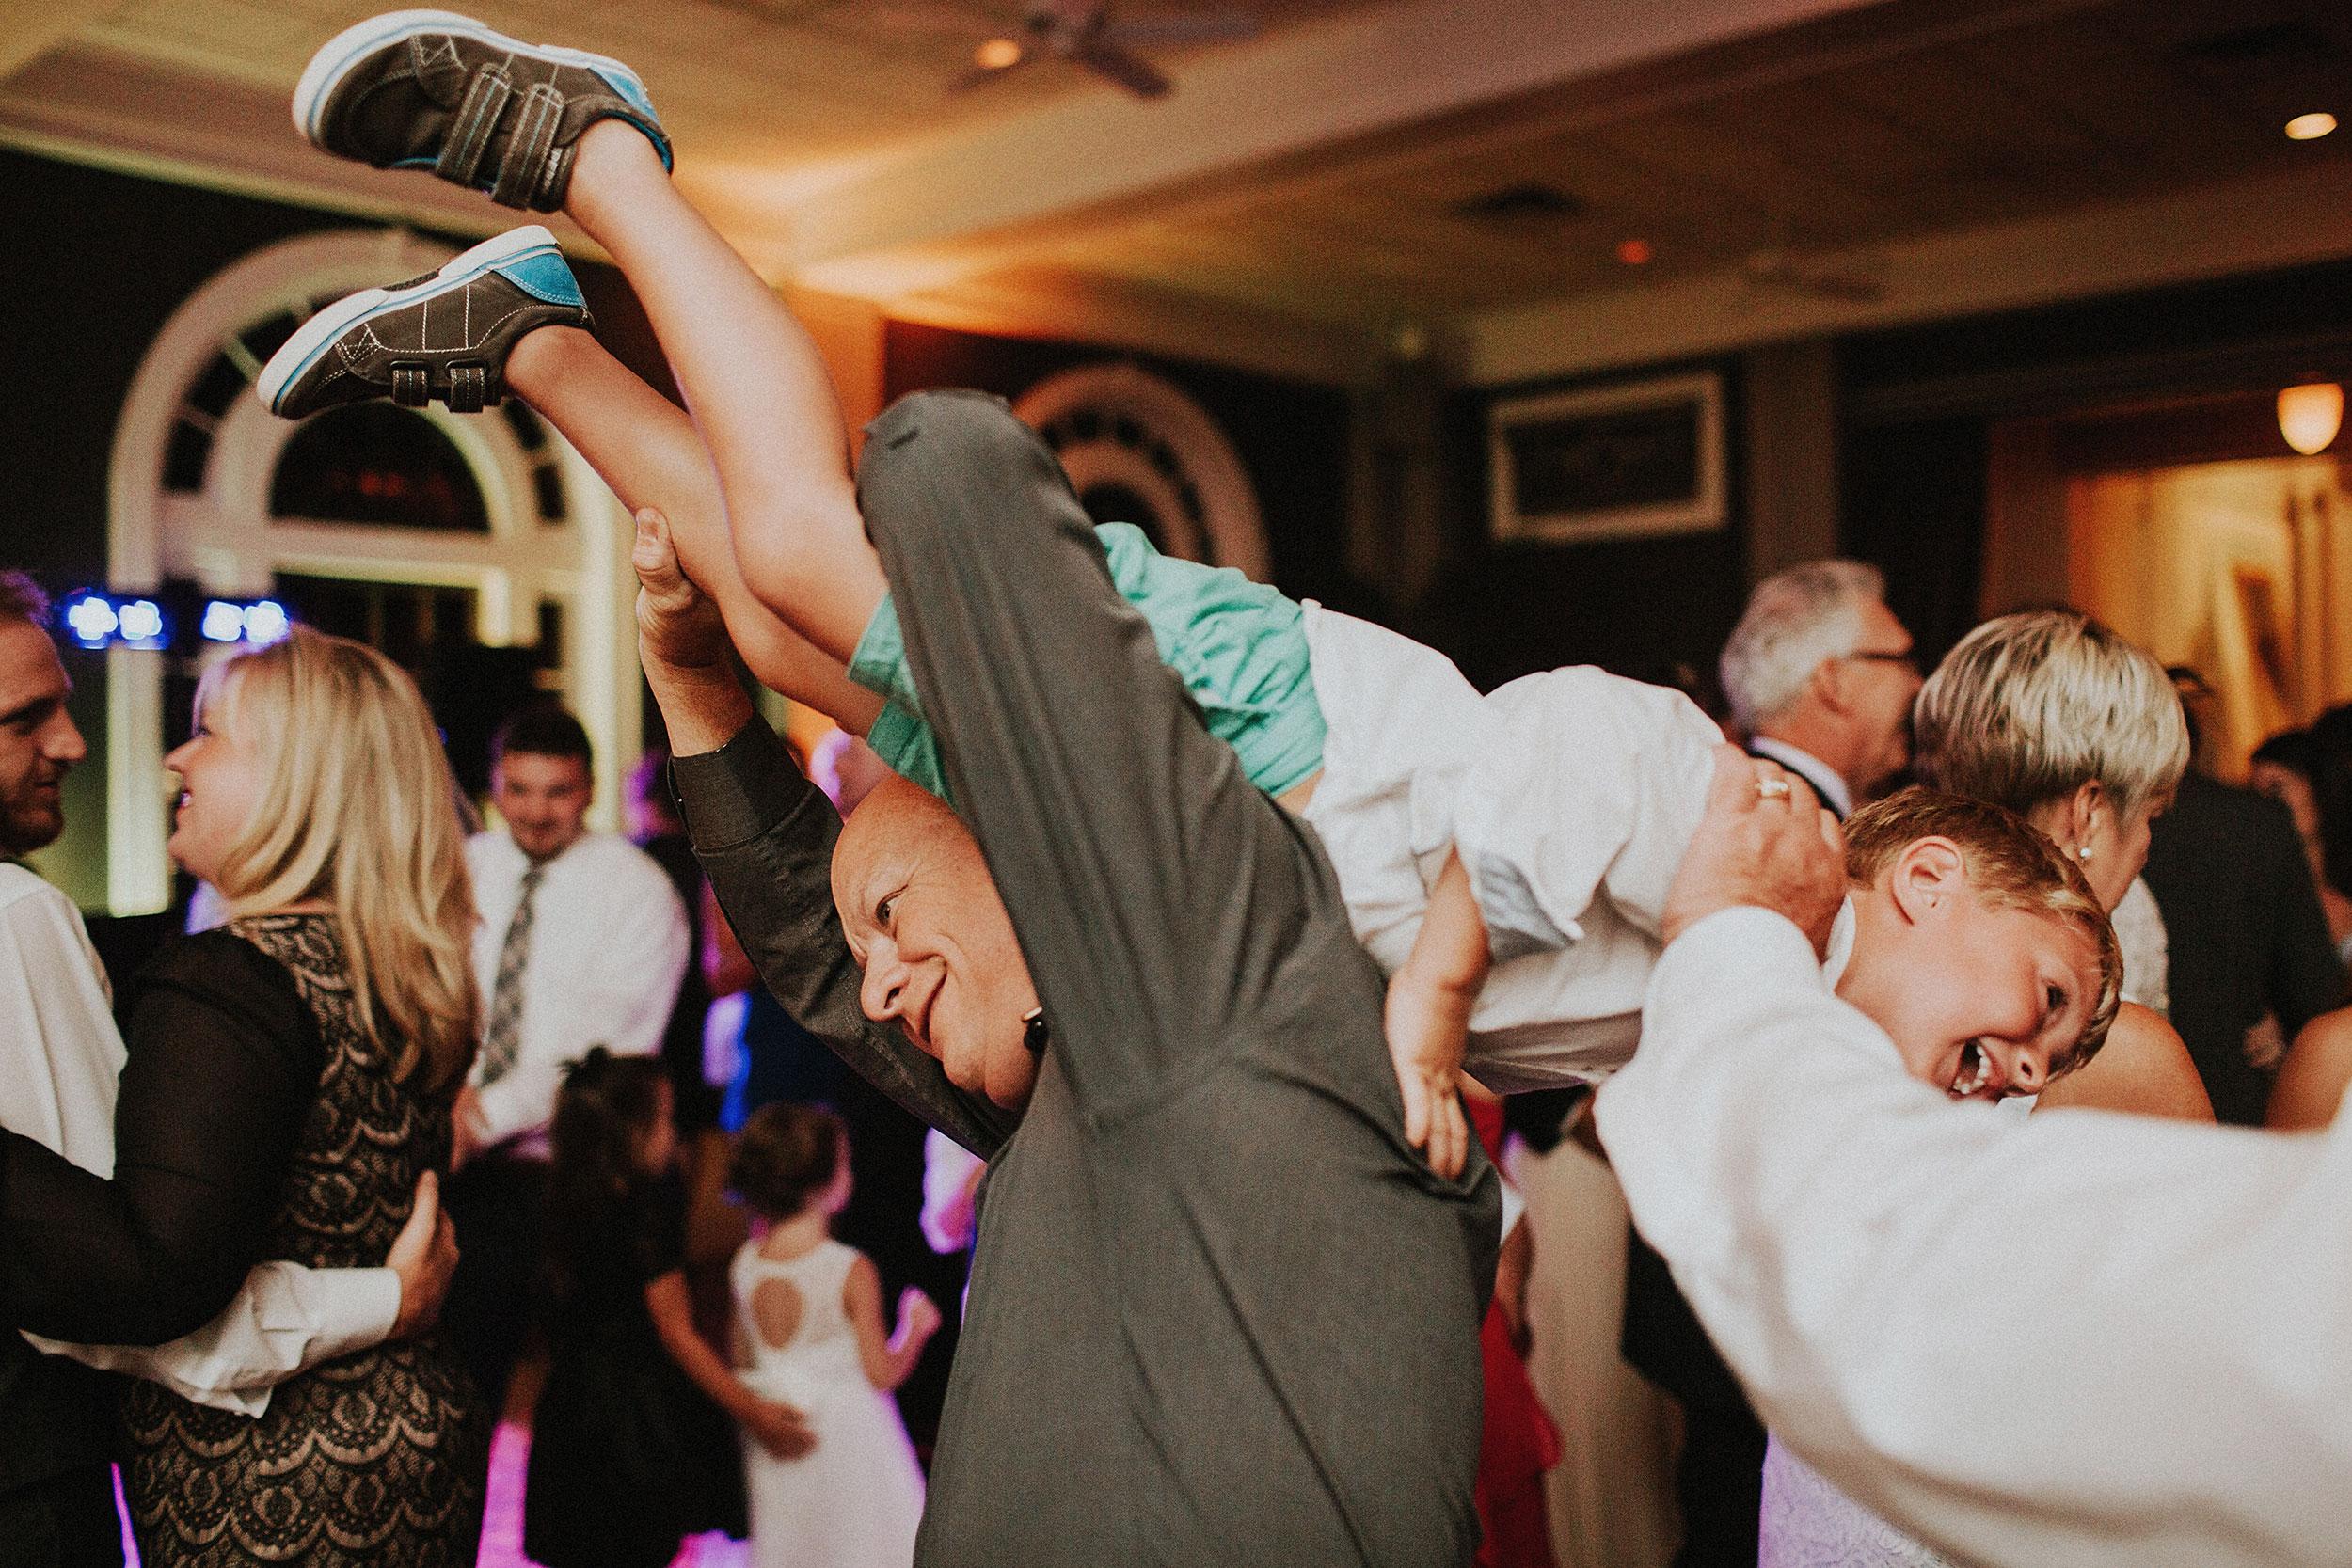 olmsted-wedding-louisville-kentucky-043.JPG